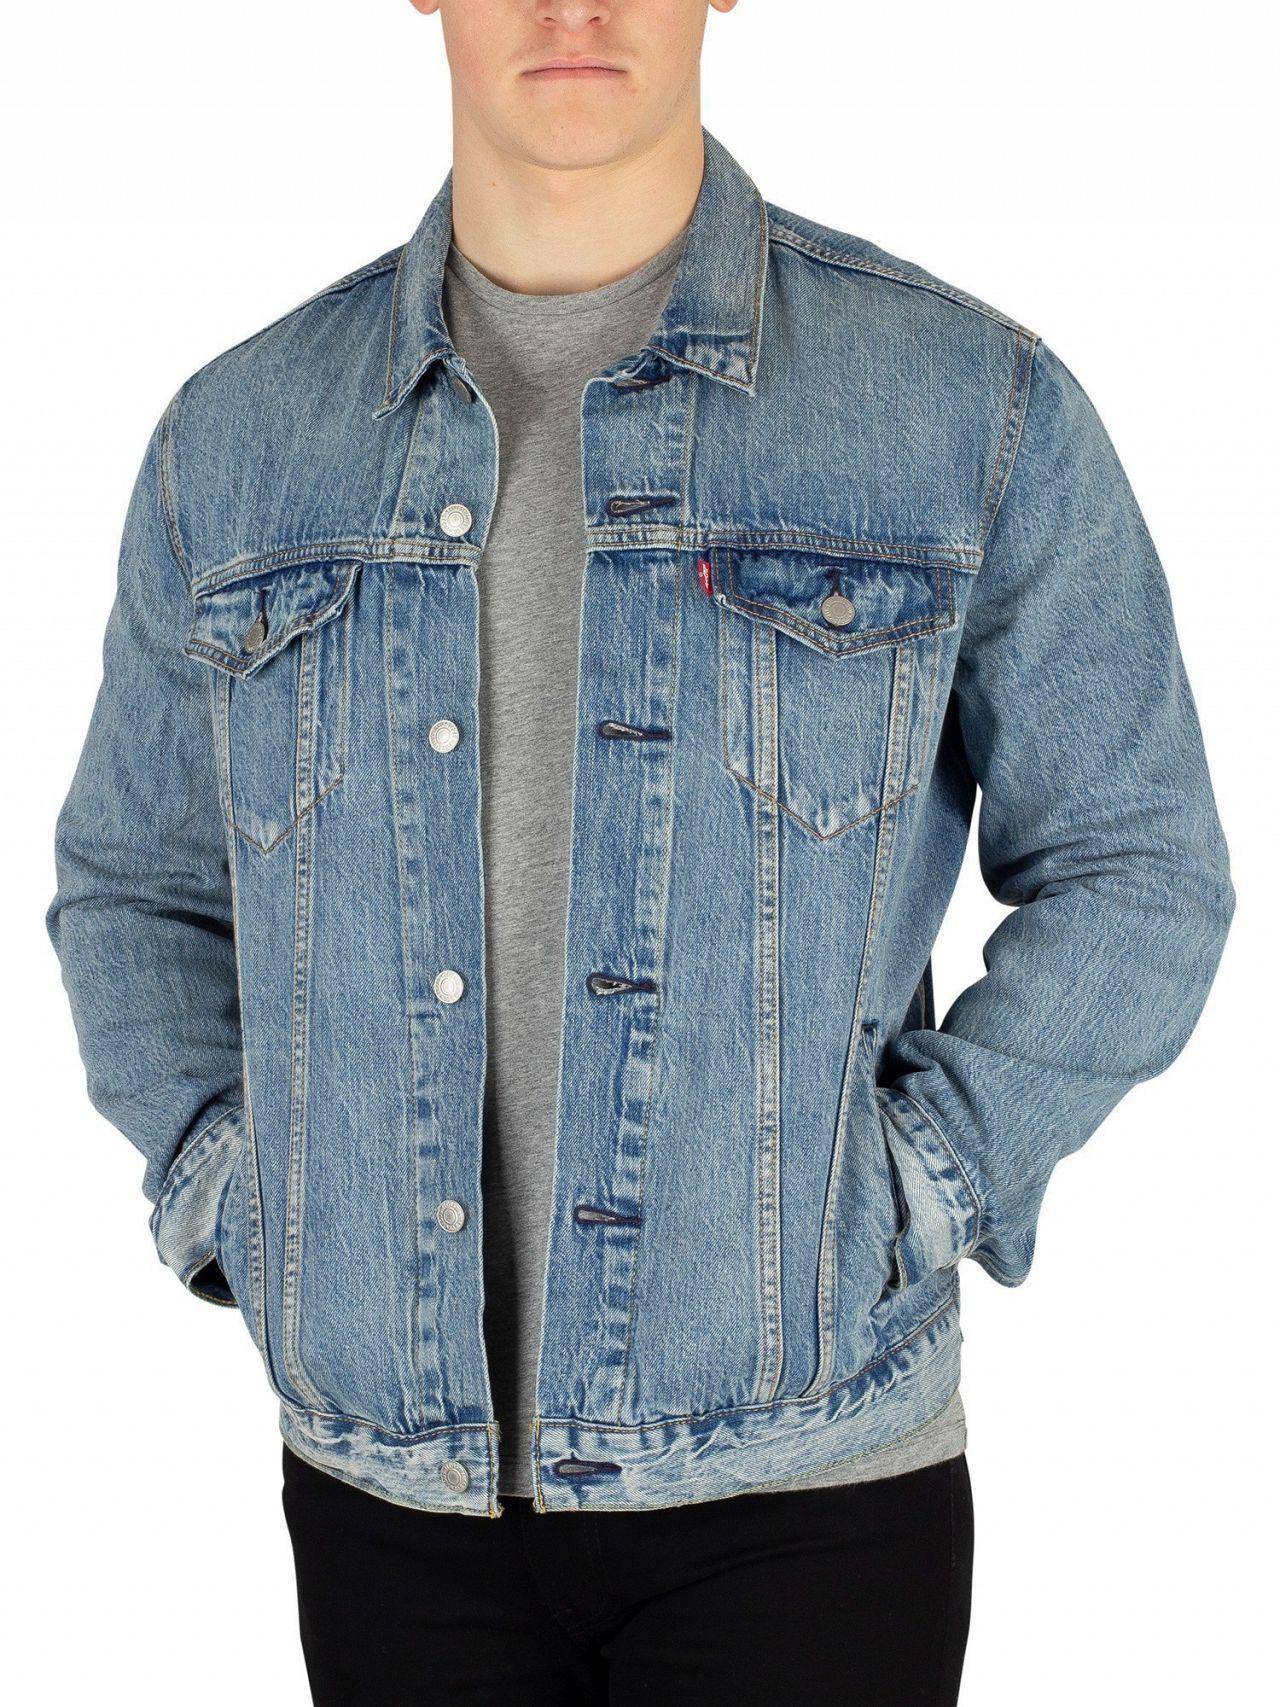 4203808e1100 Lyst - Levi s Killebrew The Trucker Jacket in Blue for Men